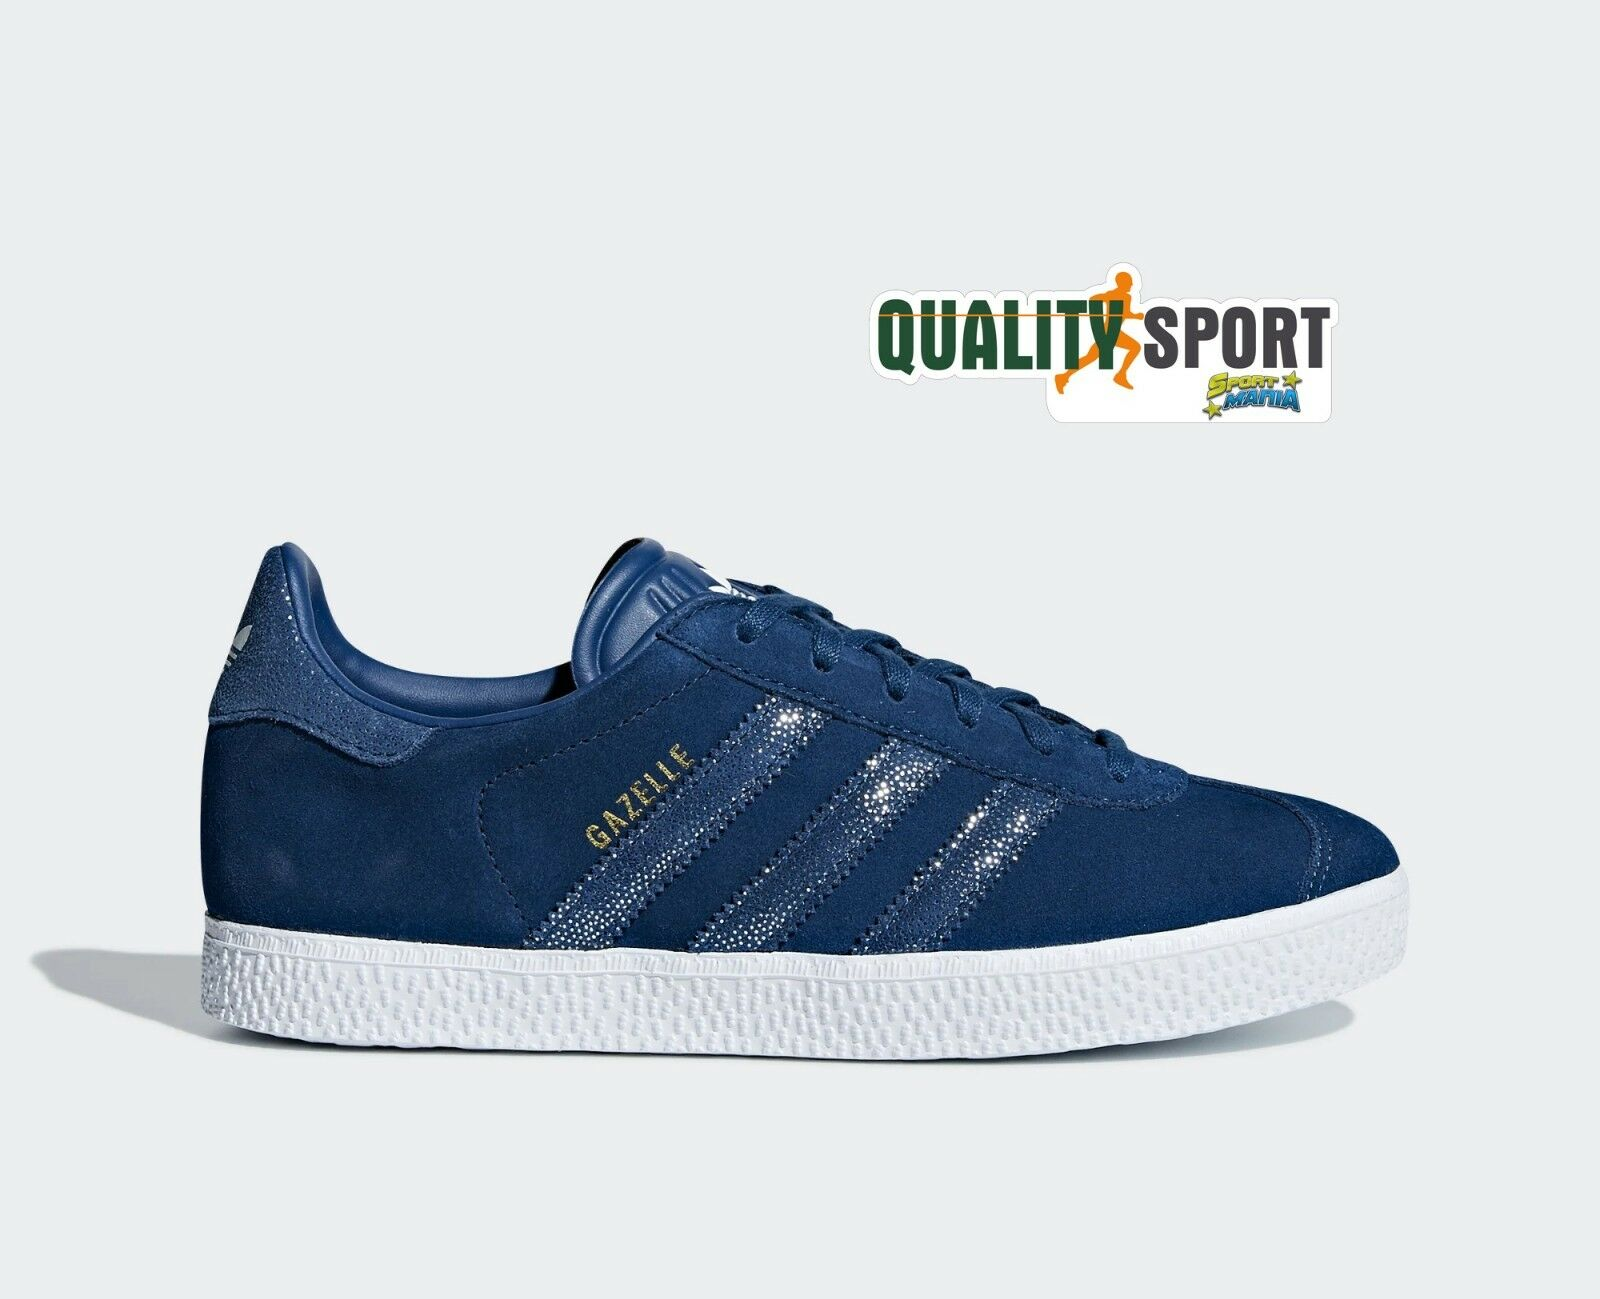 Adidas Gazelle blue shoes women shoes Sportive Sneakers CG6695 2019